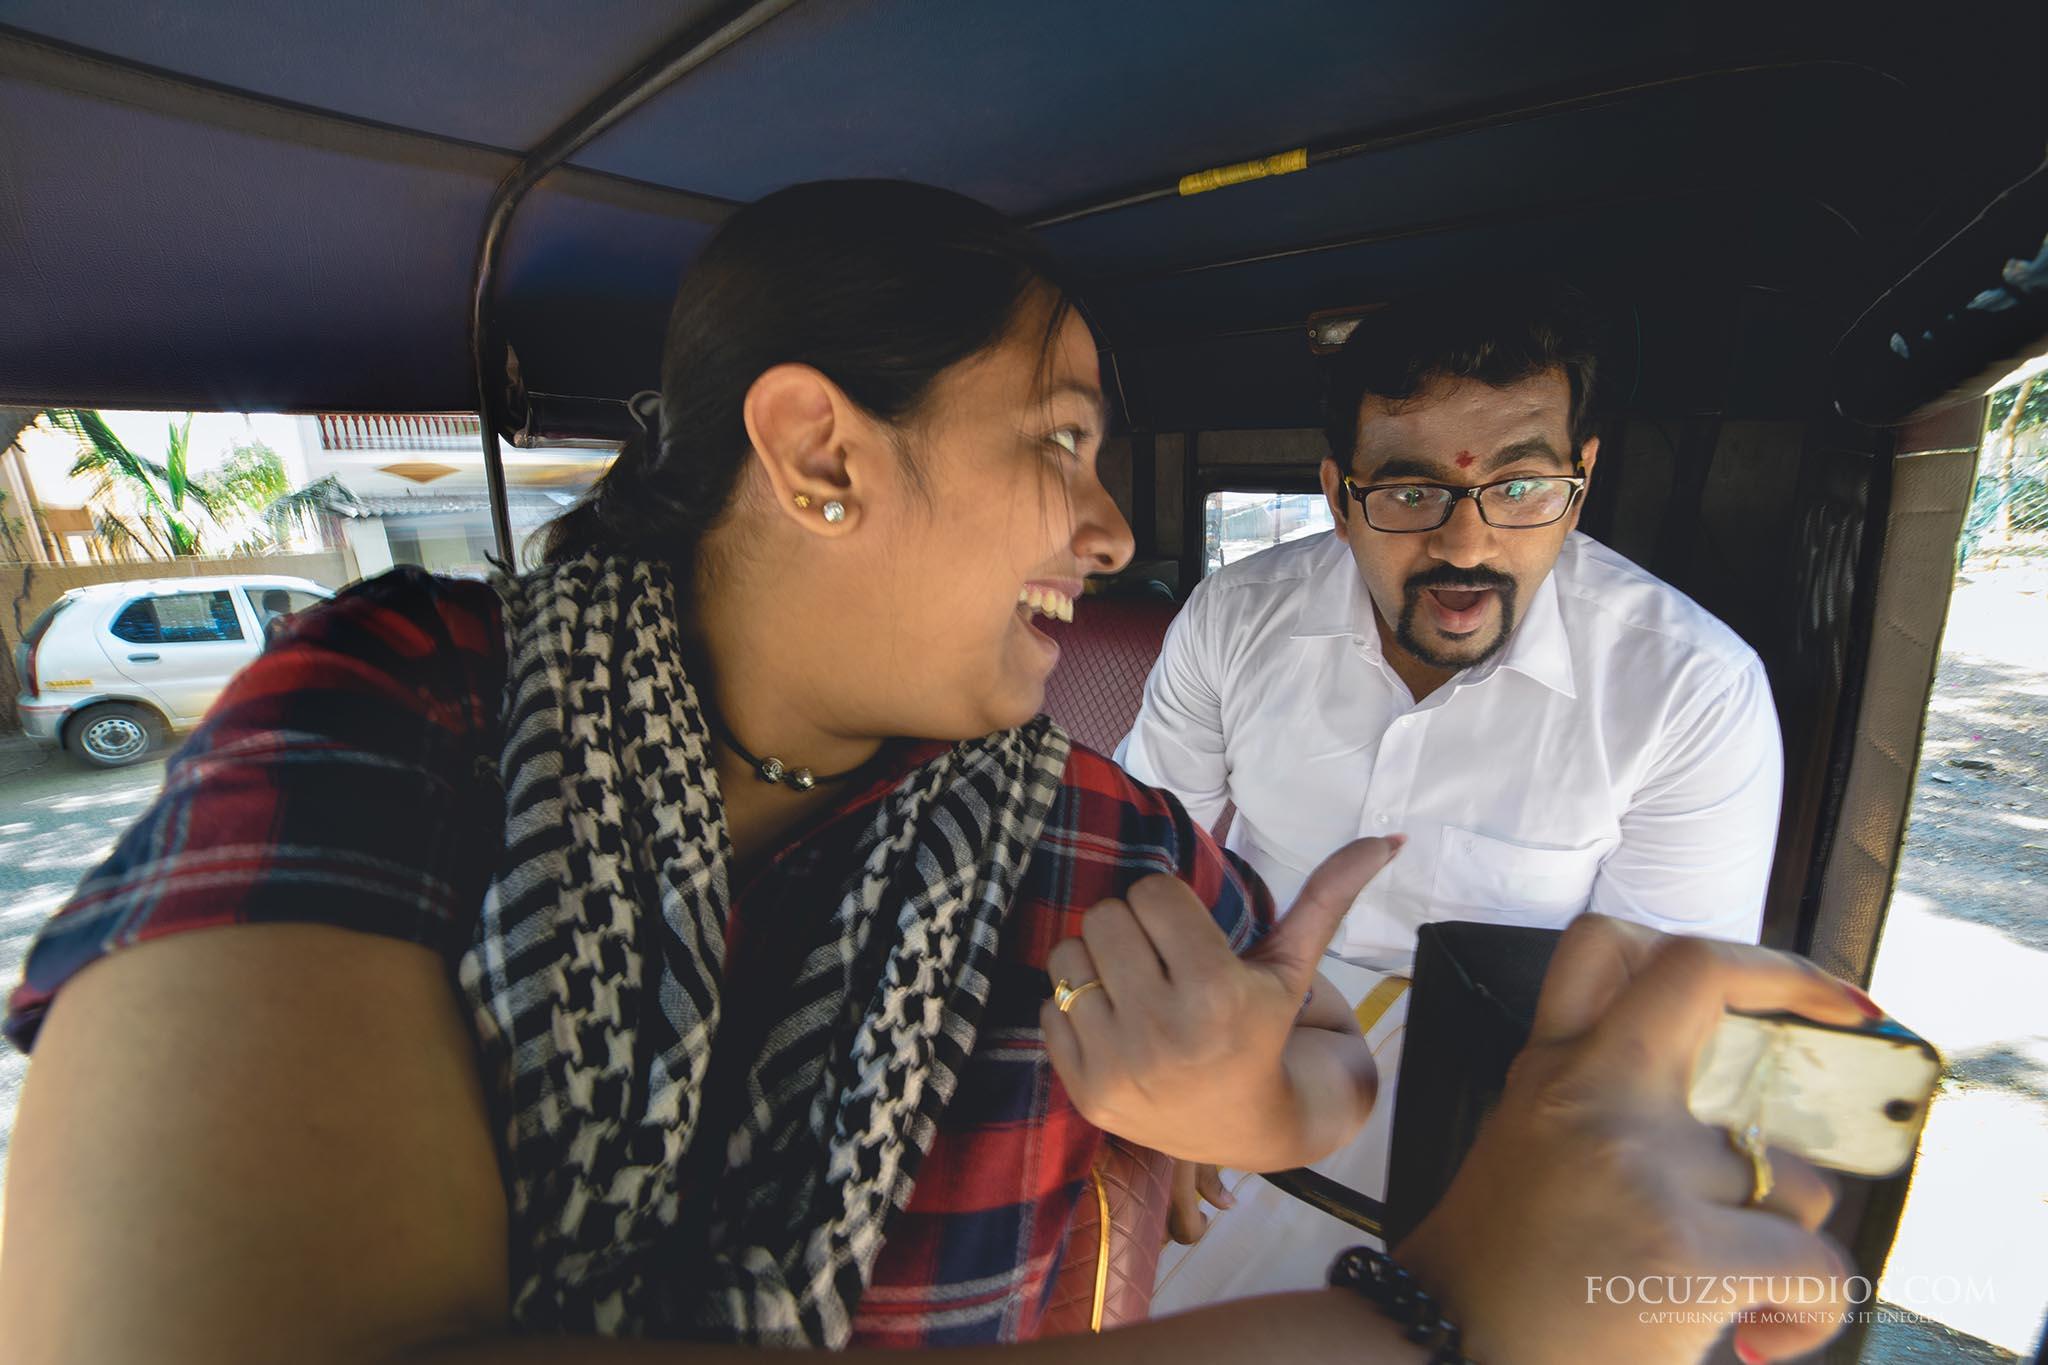 couple-shoot-in-chennai-city-focuz-studios-9